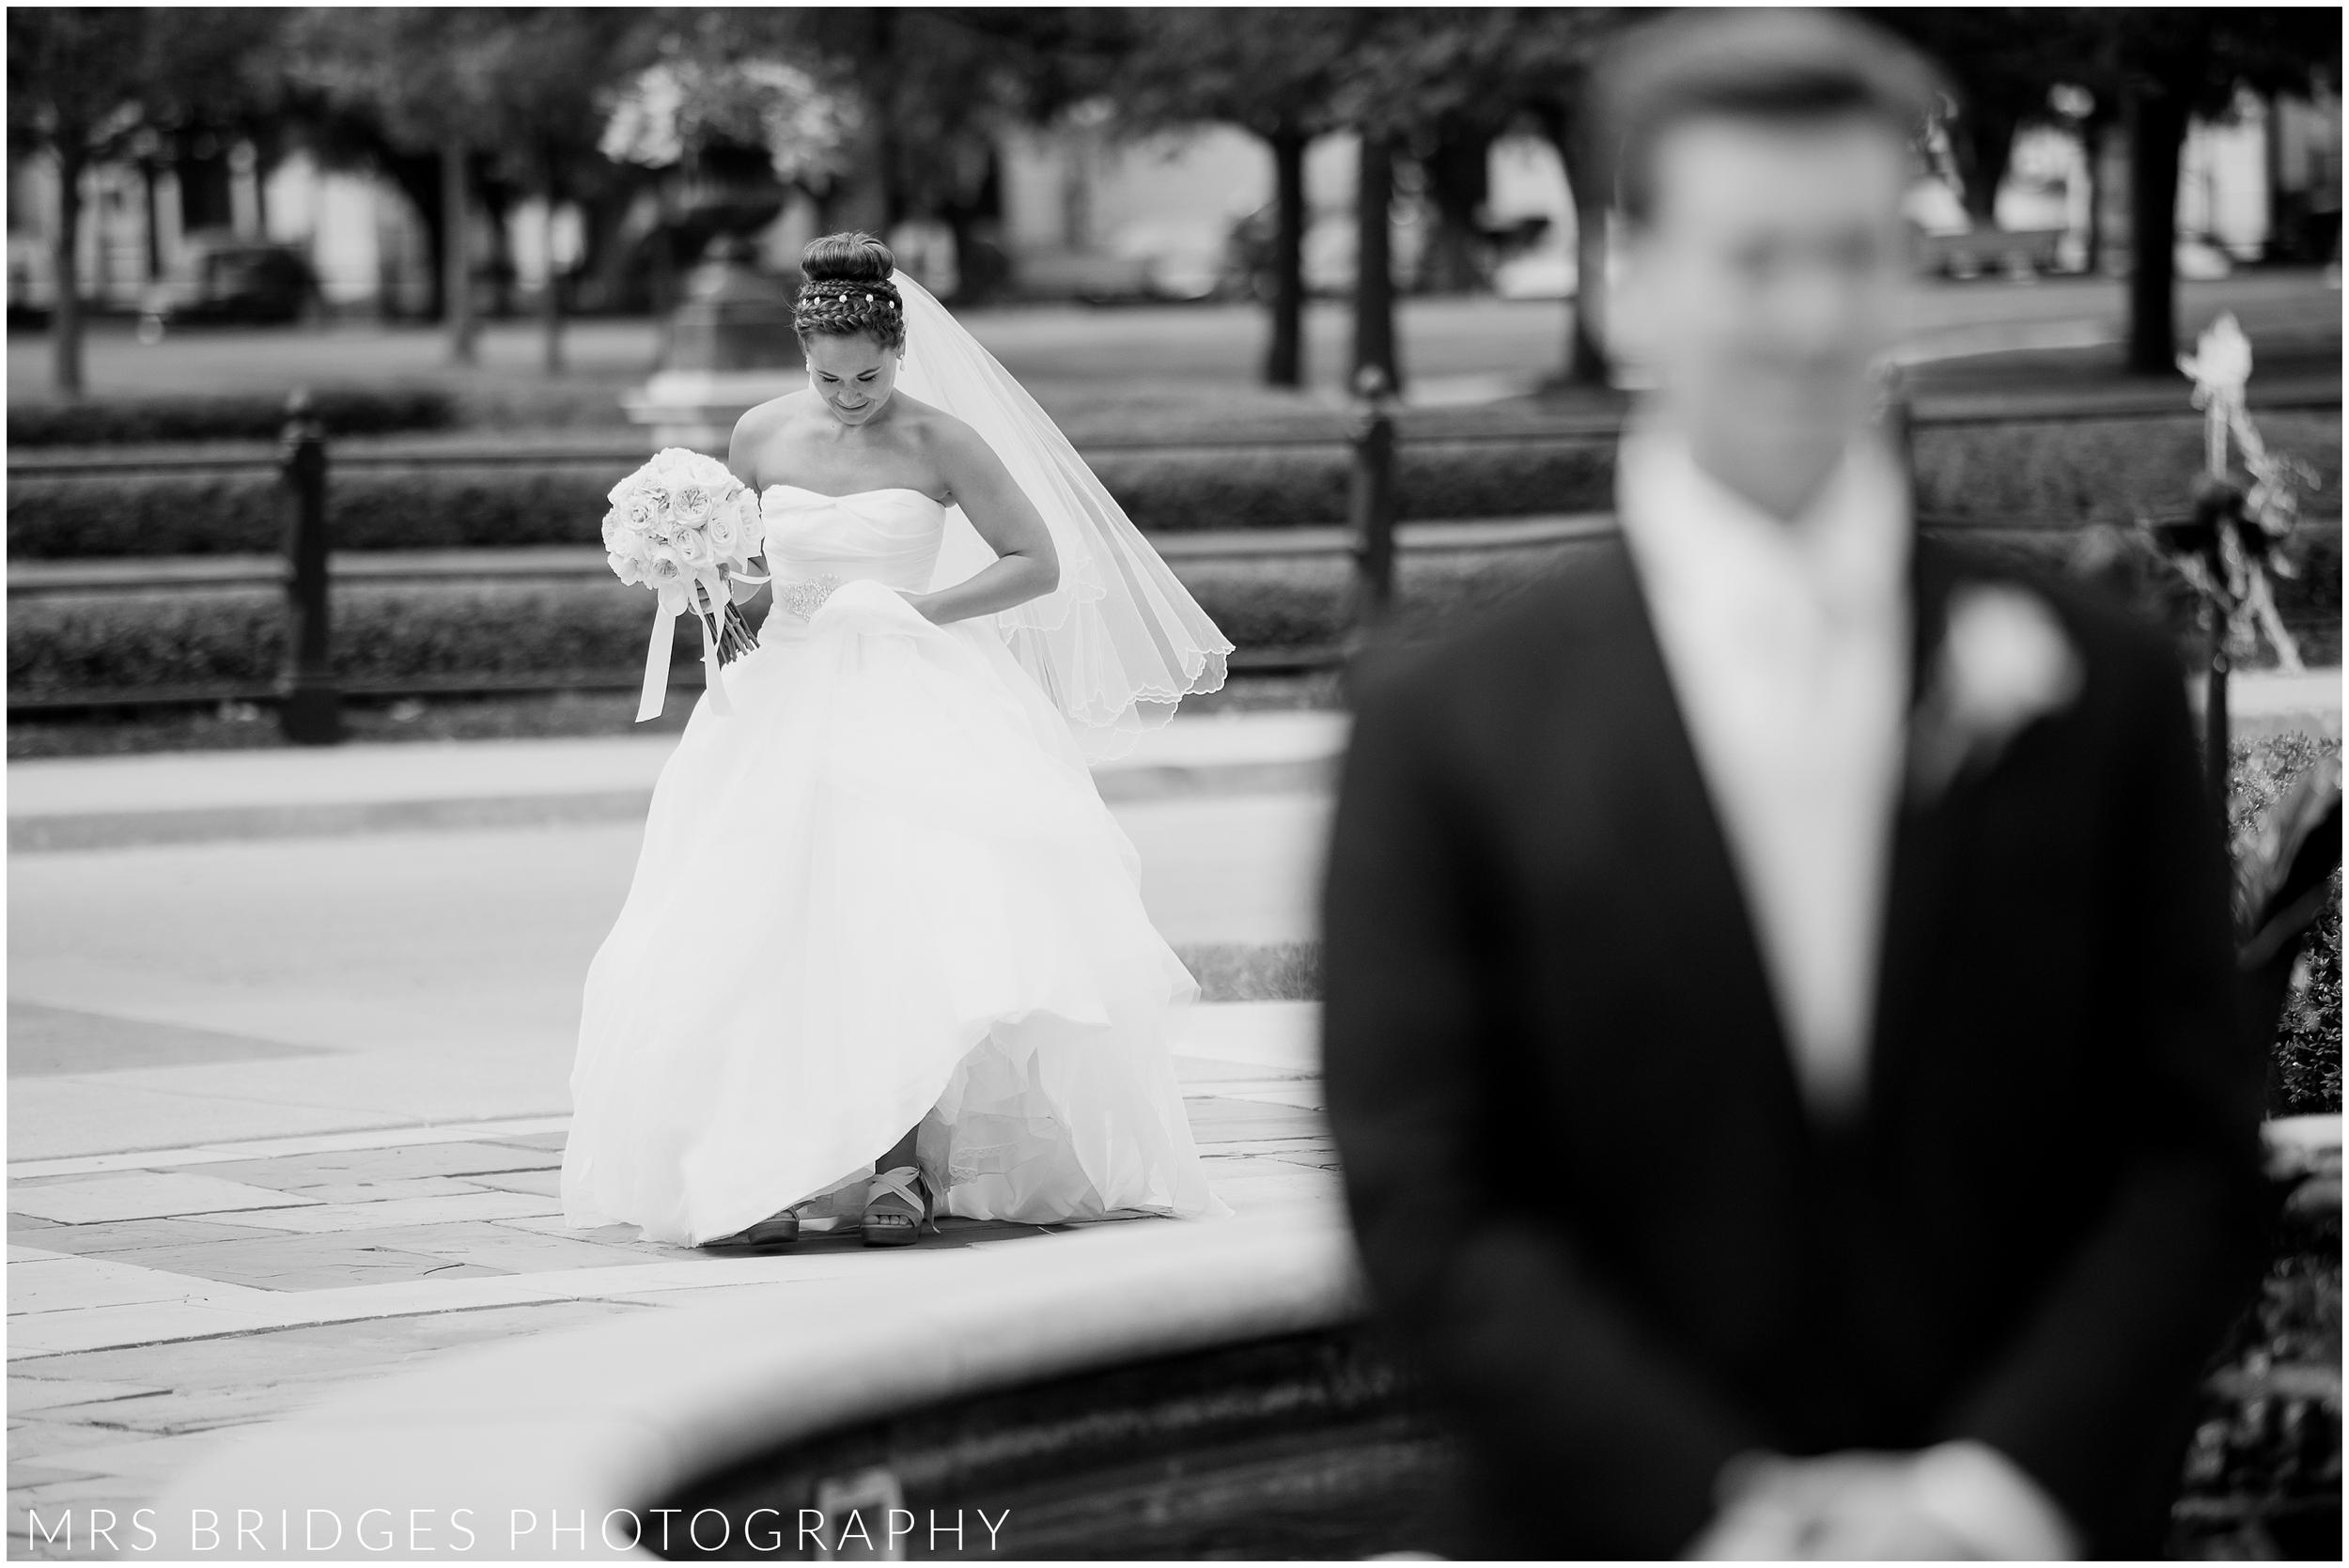 Rebecca_Bridges_Photography__2843.jpg